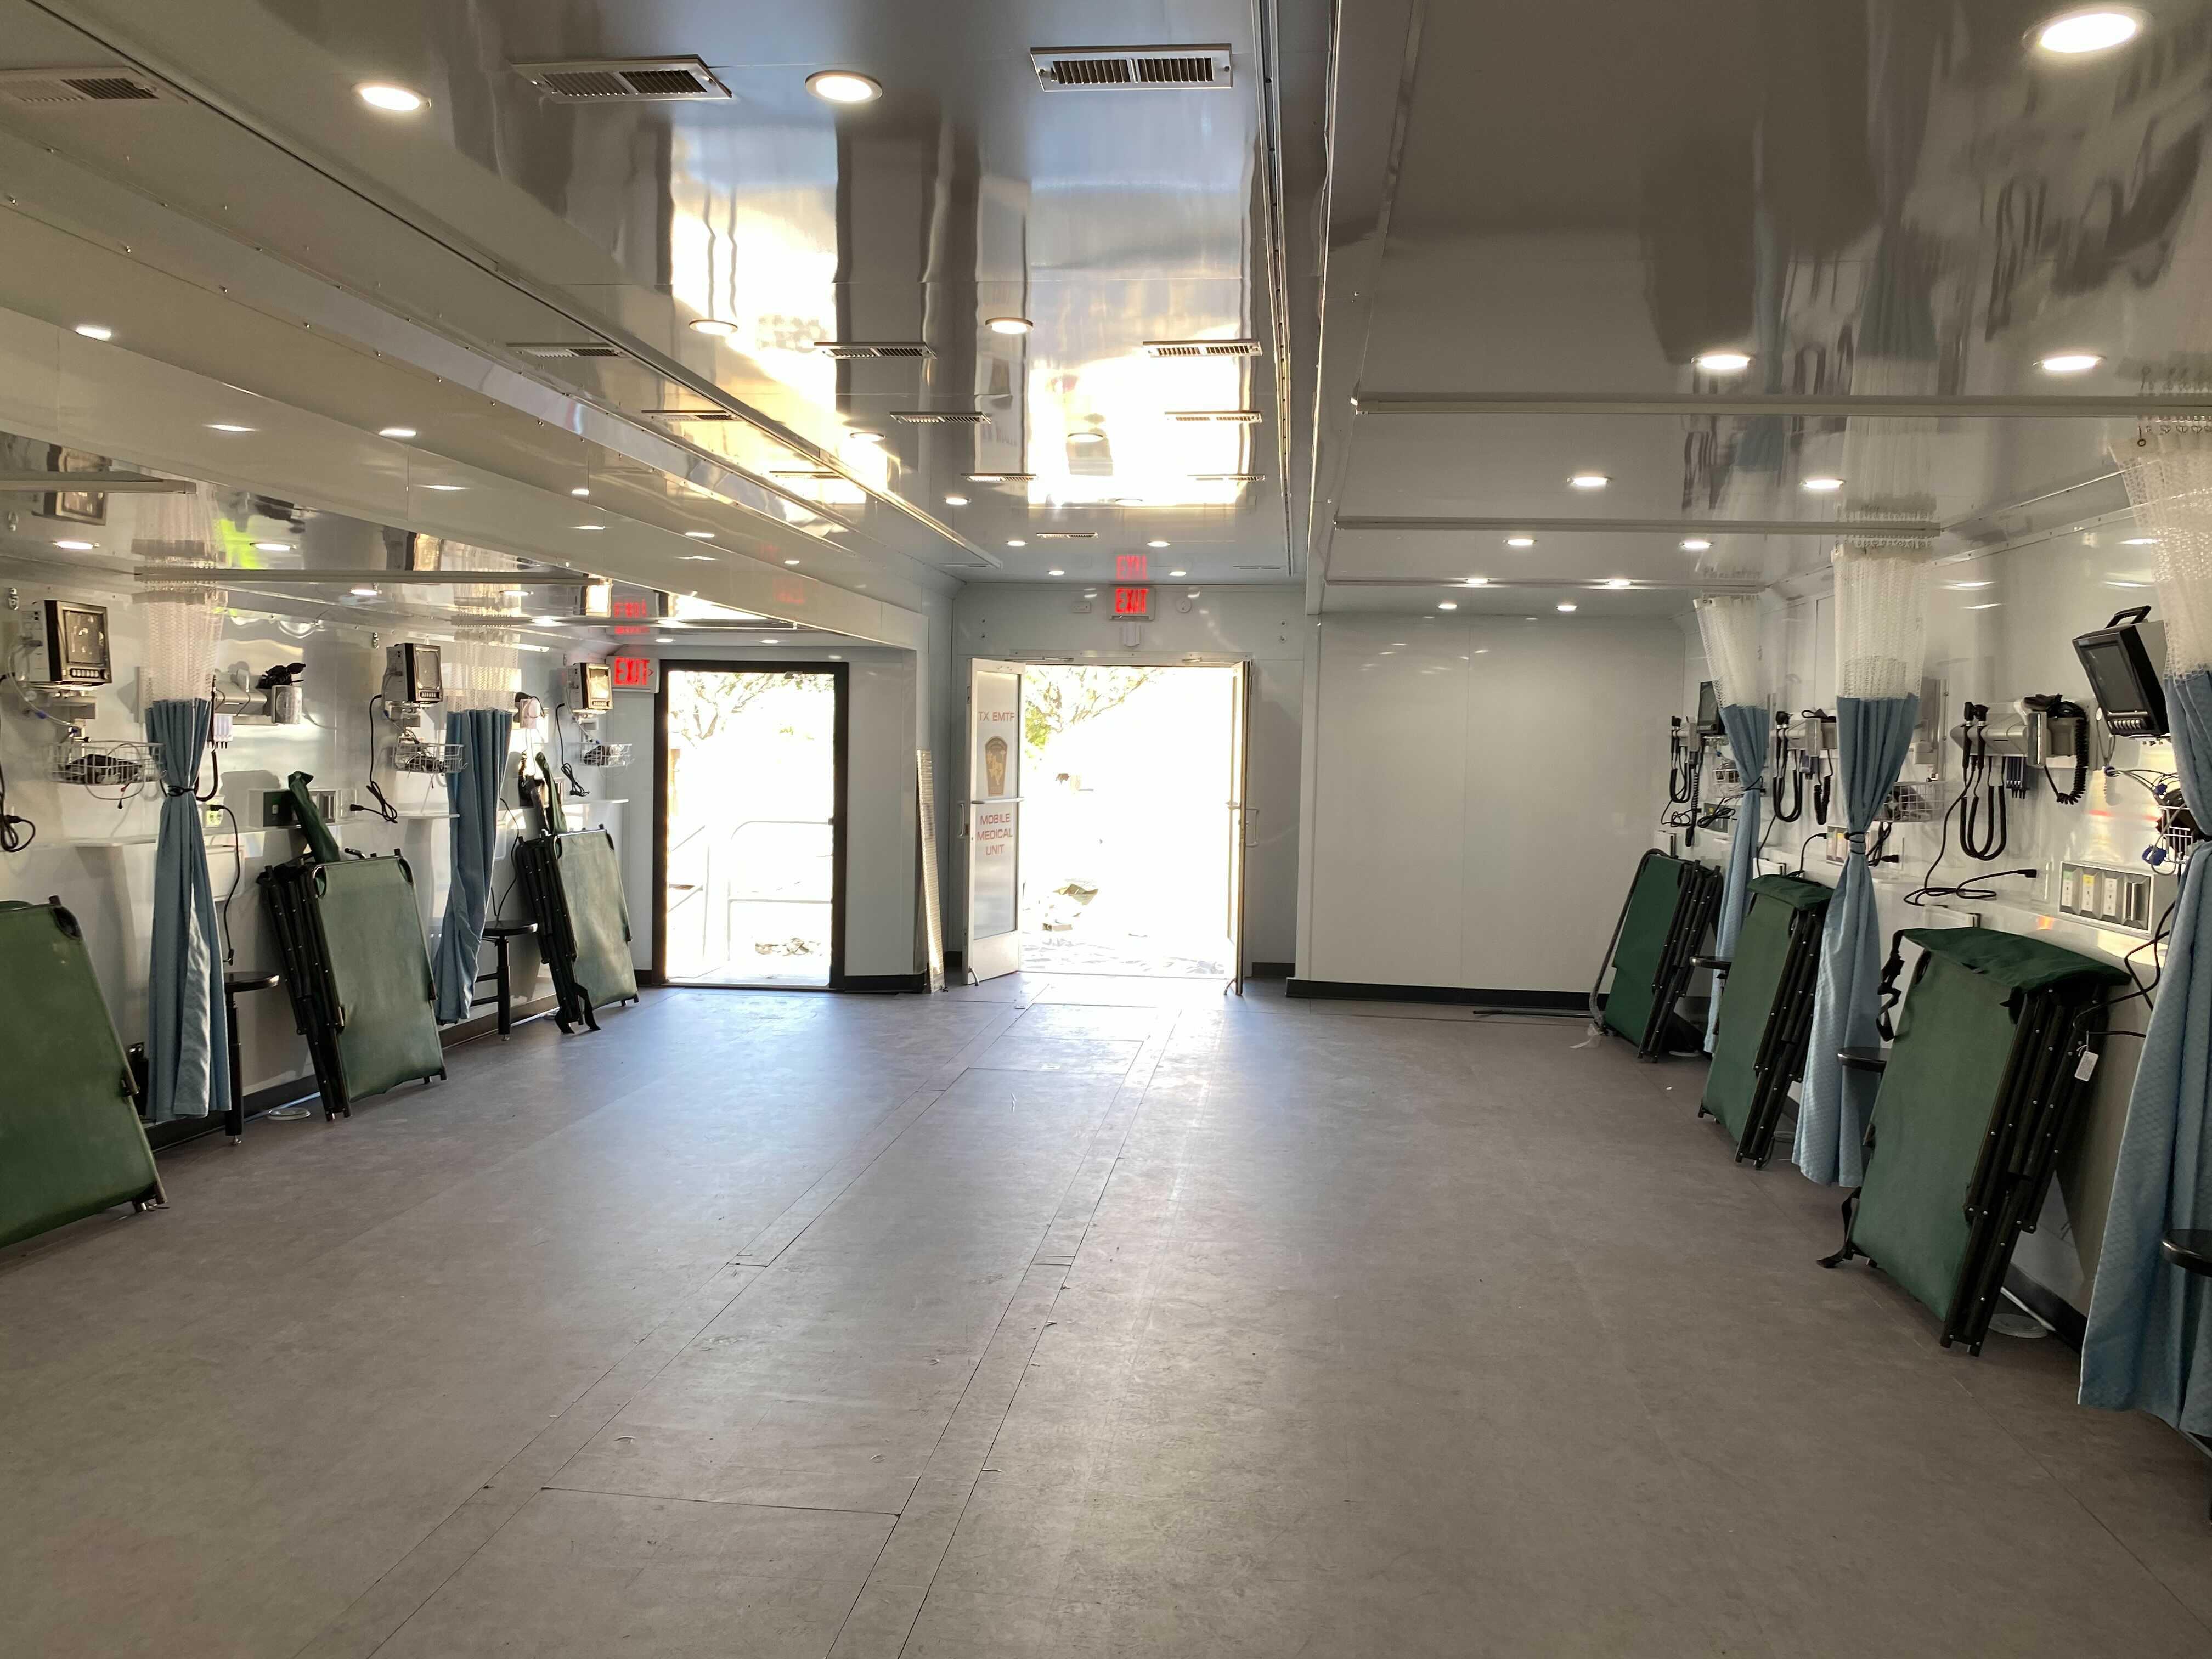 Inside the COVID-19 antibody therapy center on Jan. 5. It's set to open in east Austin (KXAN Photo/Tahera Rahman)